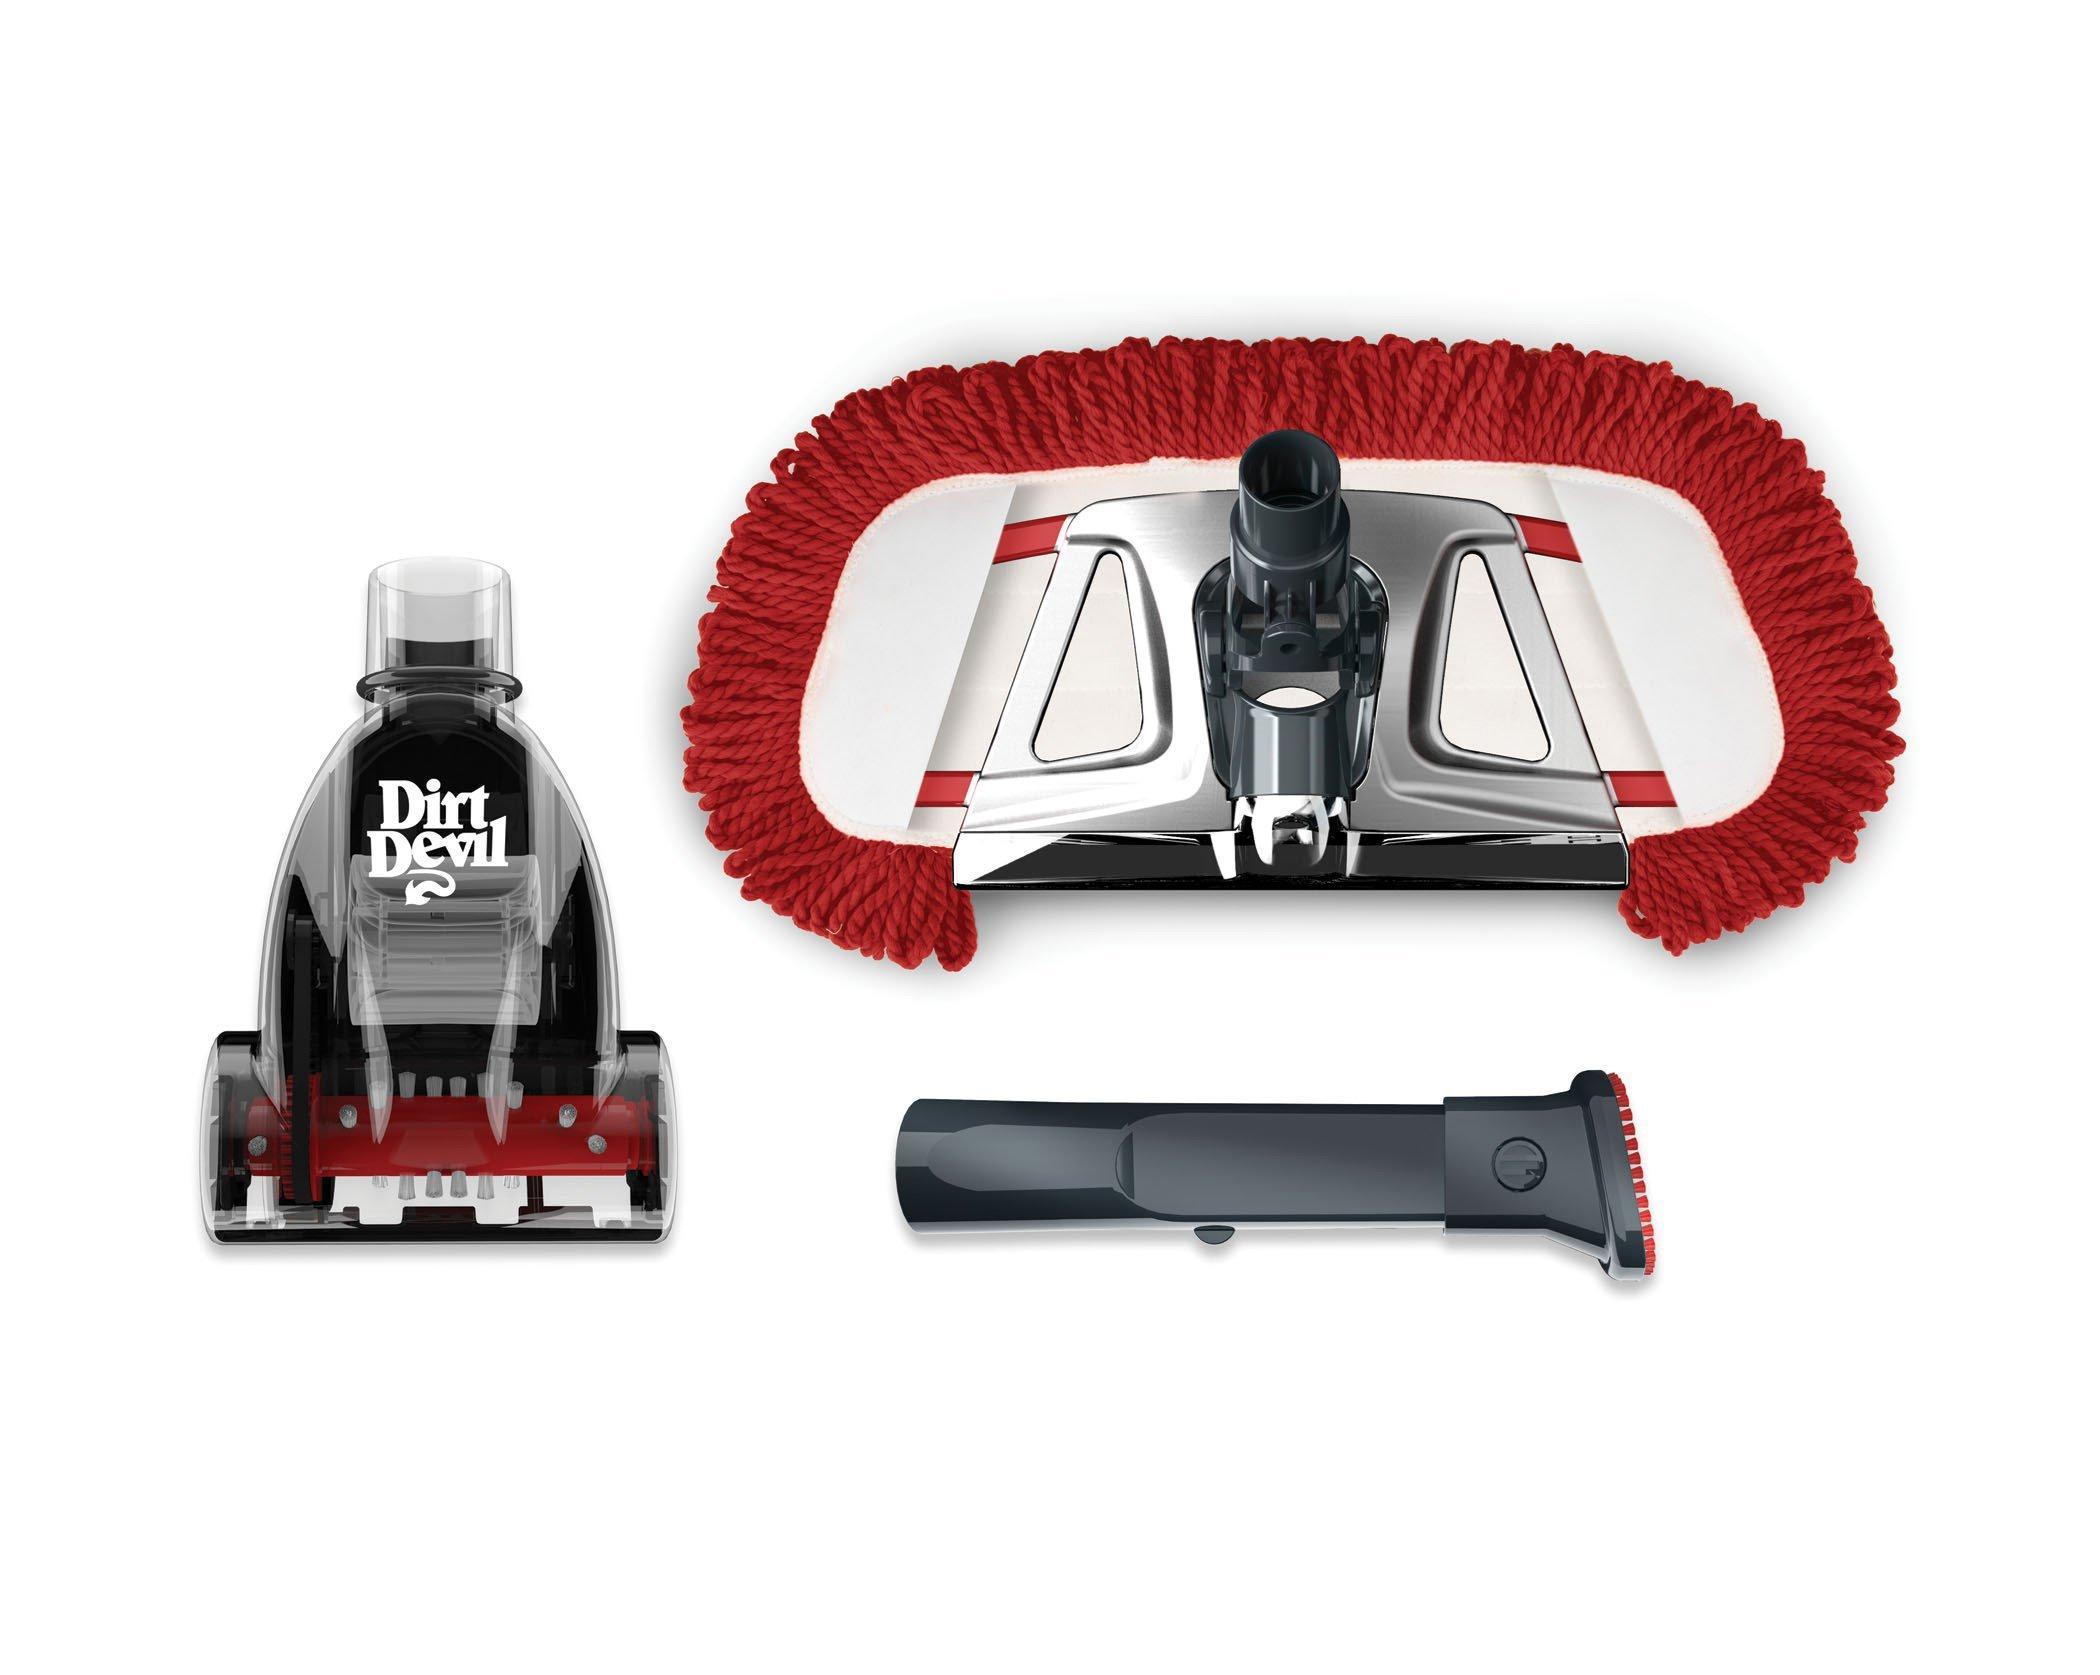 Dirt-Devil-Dash-Upright-Vacuum-Cleaner-with-Vac-Dust-Floor-Tool-UD70250B